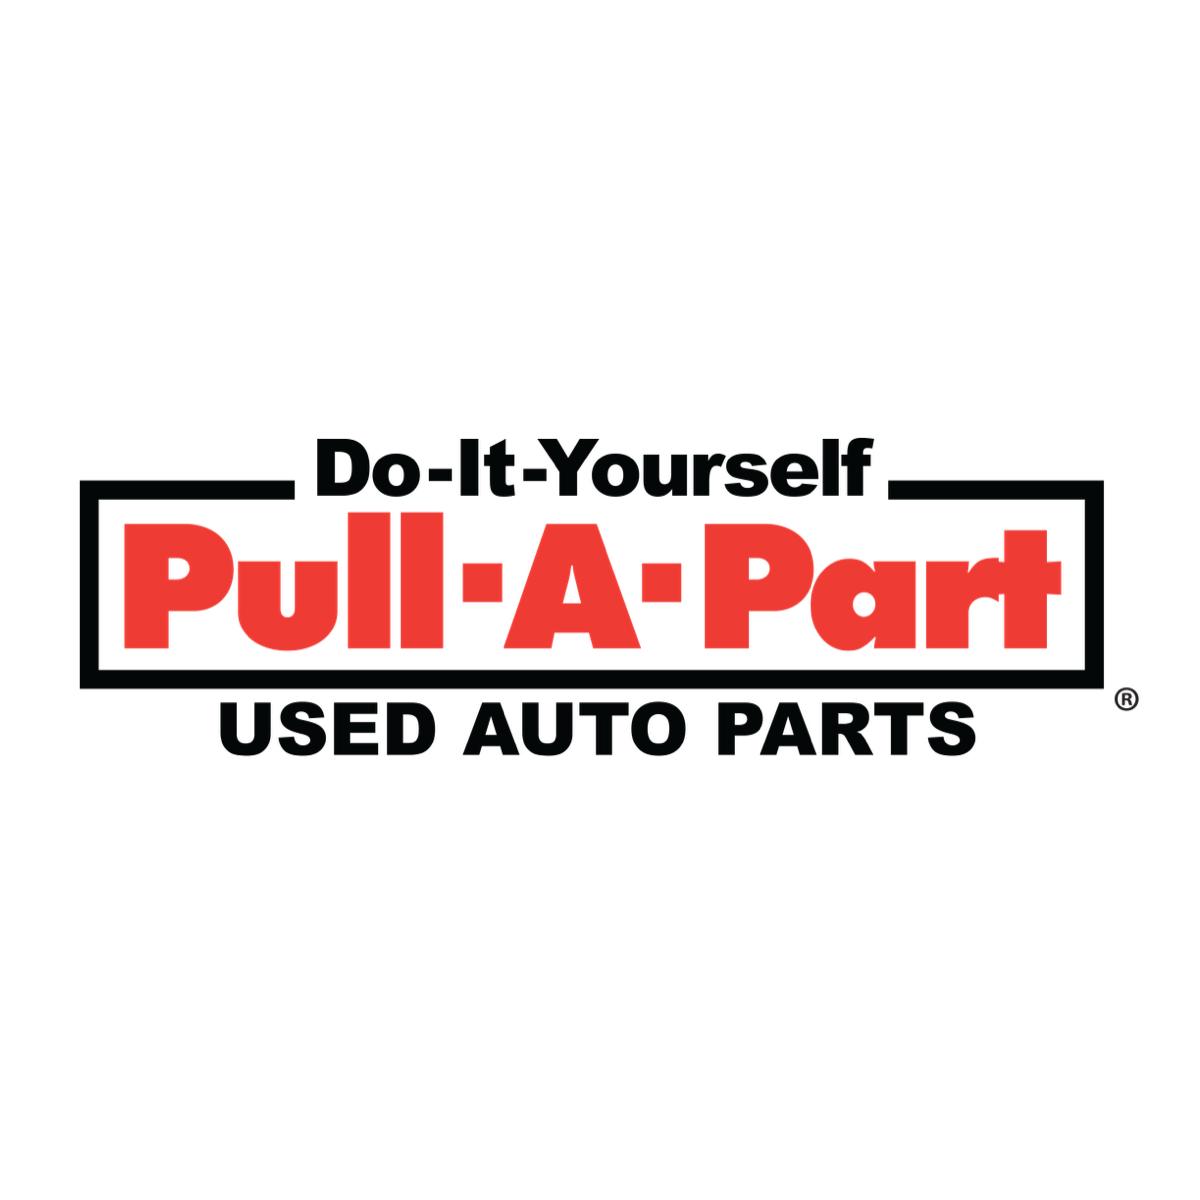 www.pullapart.com